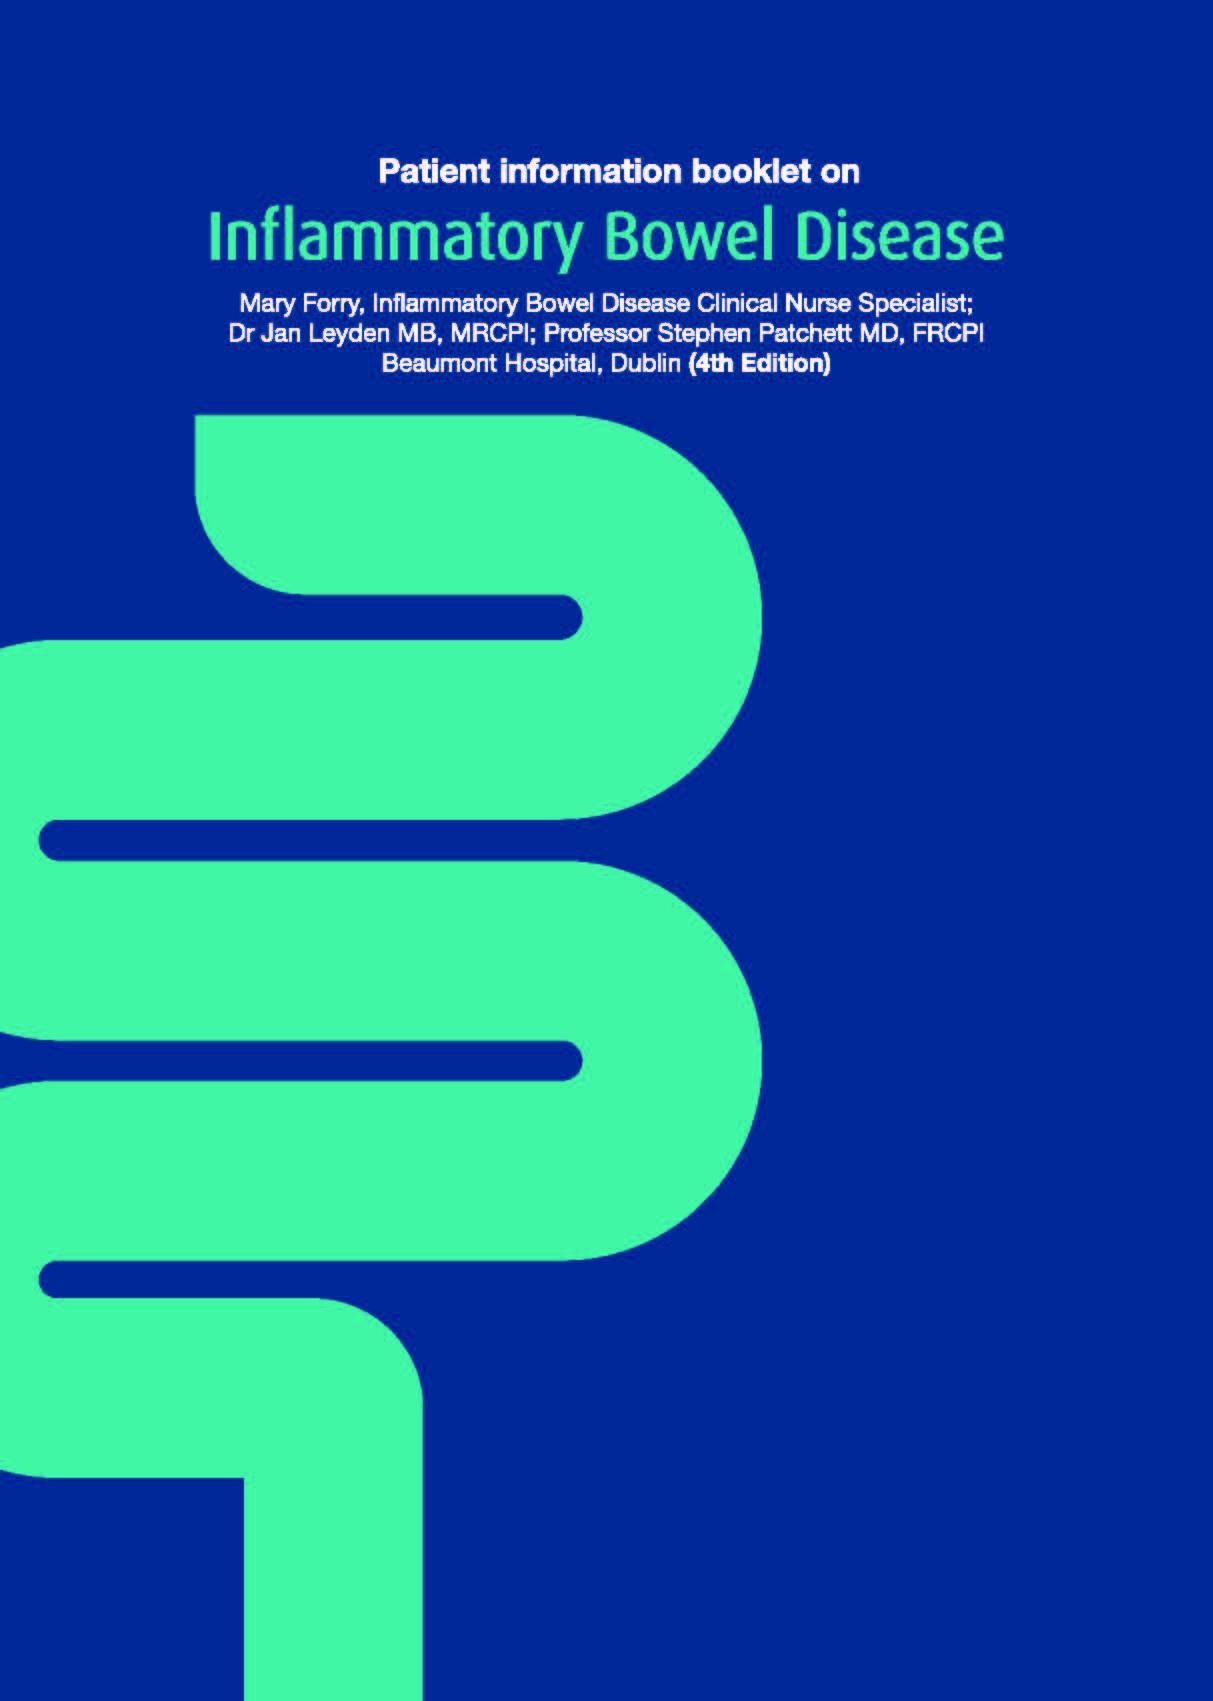 Patient Information Booklet on IBD